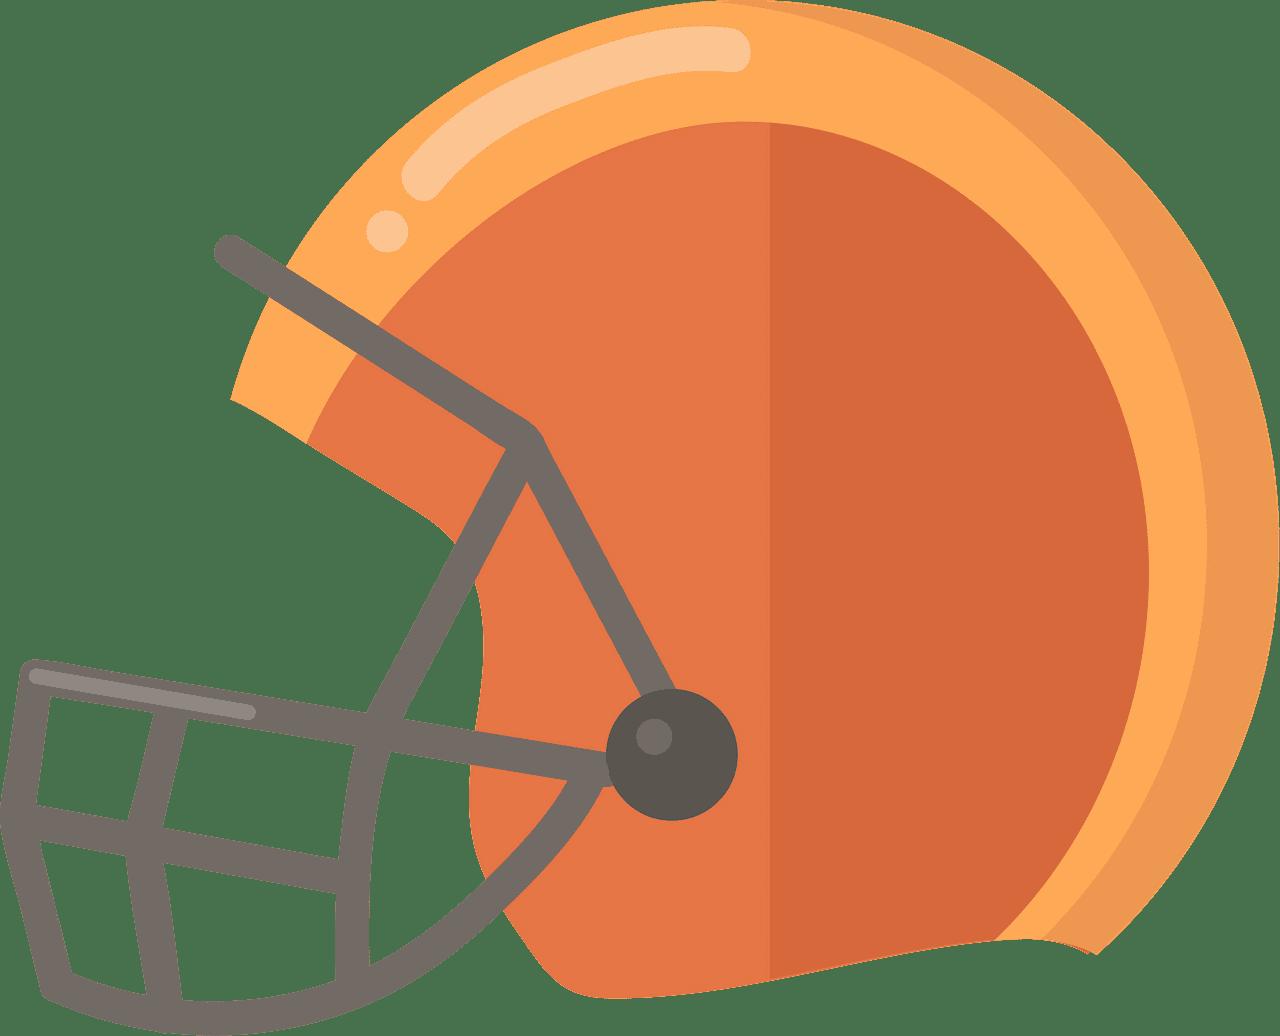 Football Helmet clipart transparent images